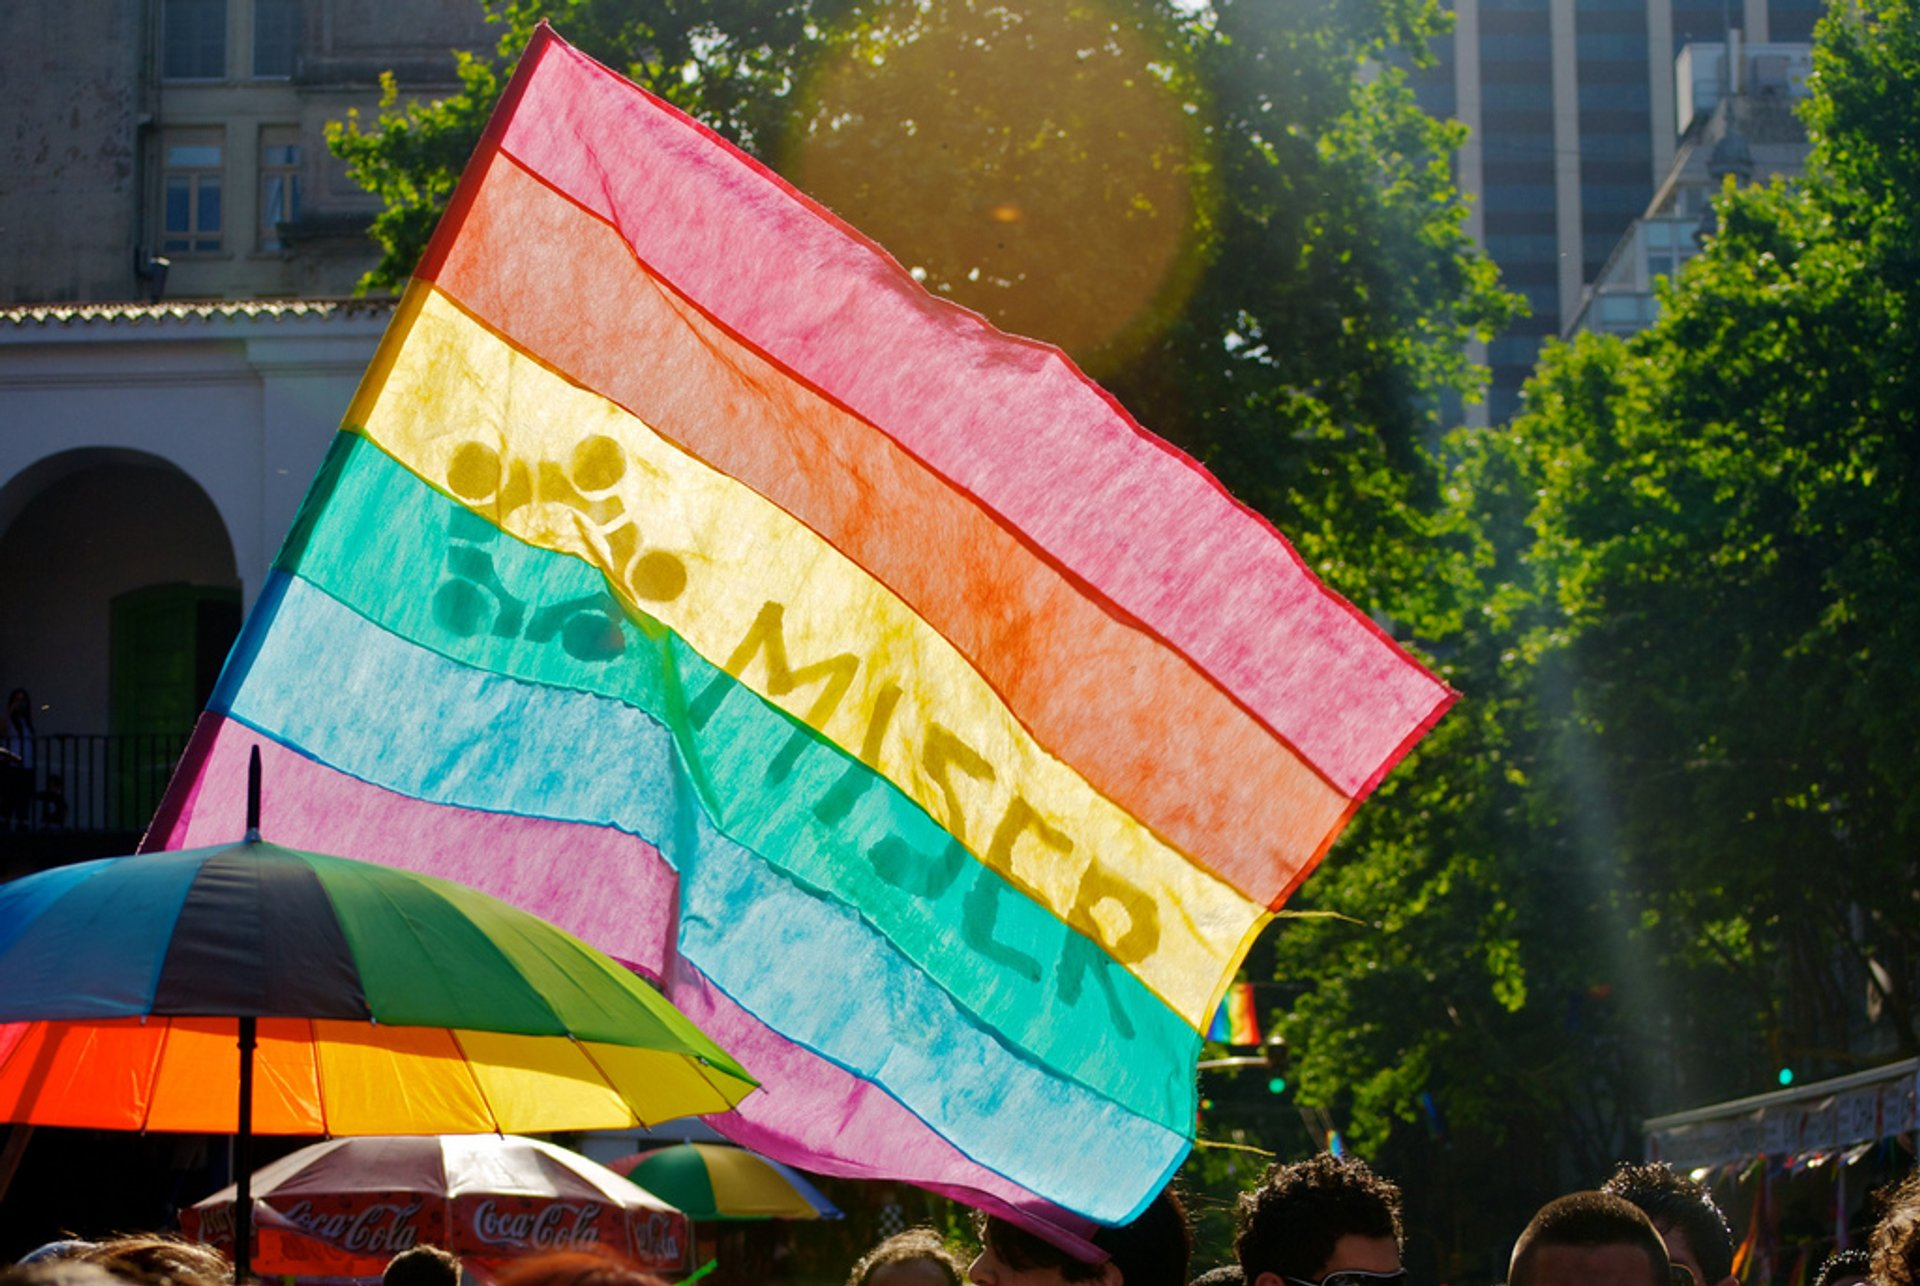 Marcha del Orgullo LGBTI (Buenos Aires Gay Pride) in Buenos Aires 2020 - Best Time